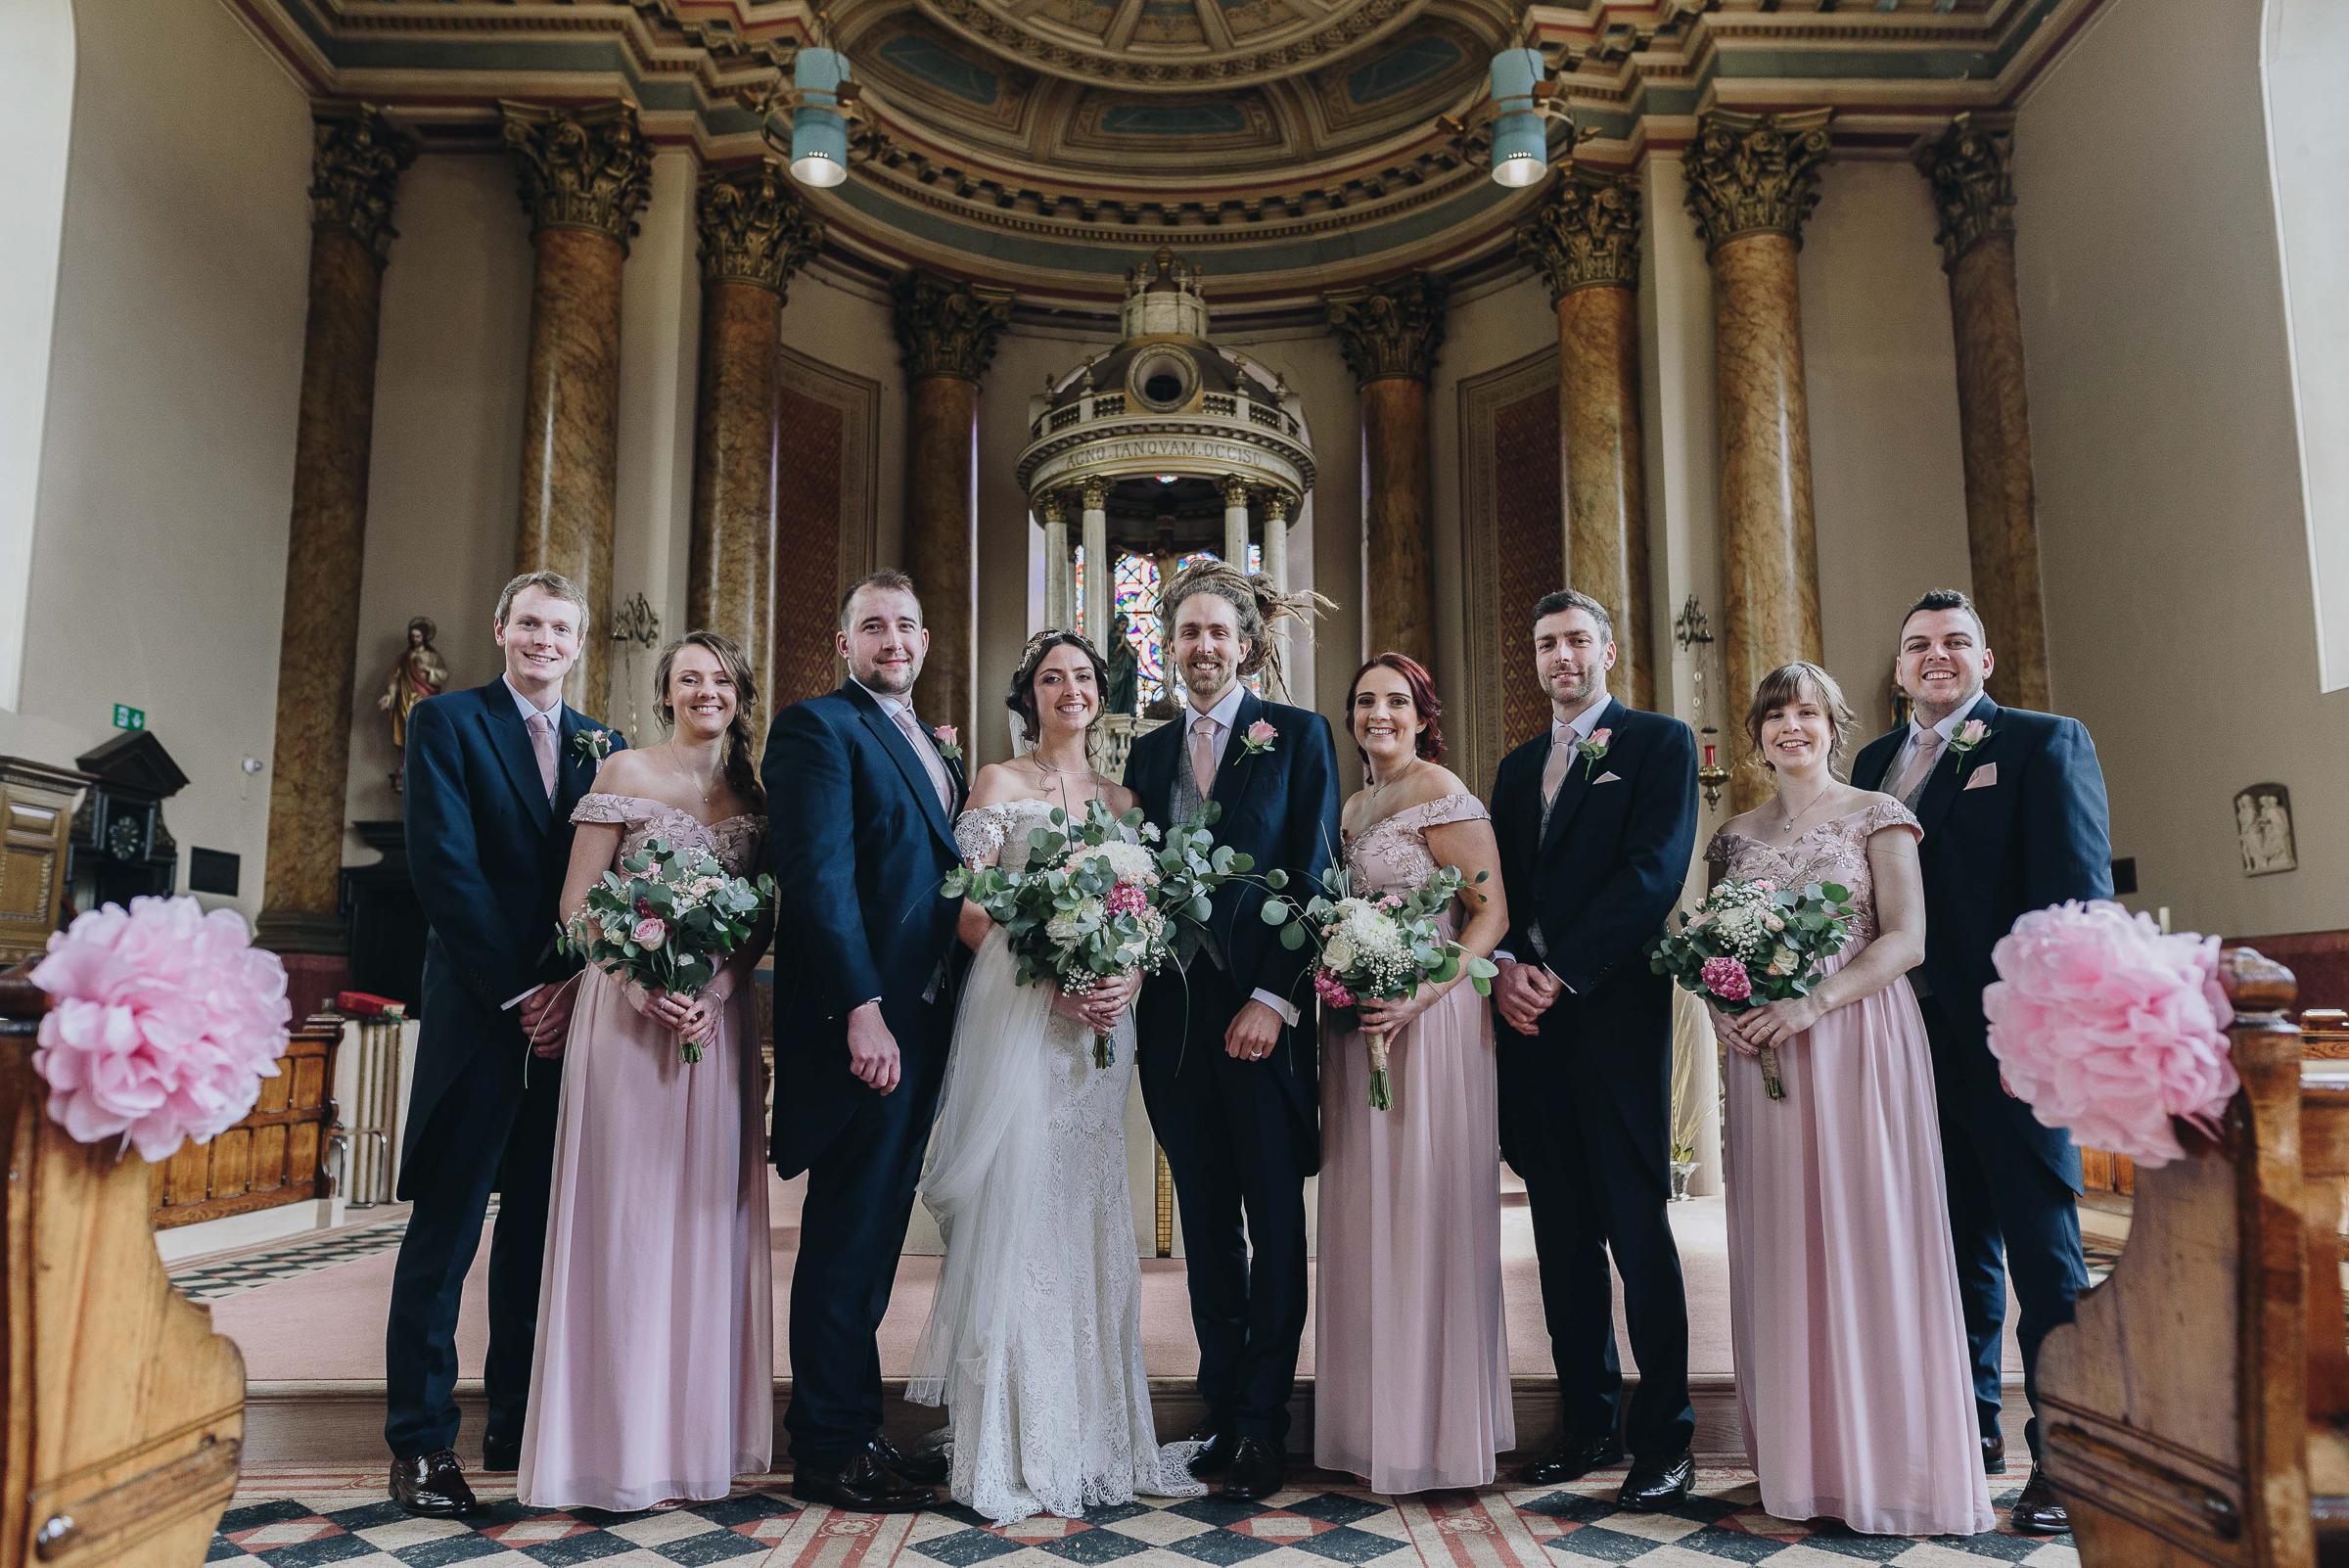 Rochdale-town-hall-vegan-harry-potter-wedding-photography-25.jpg